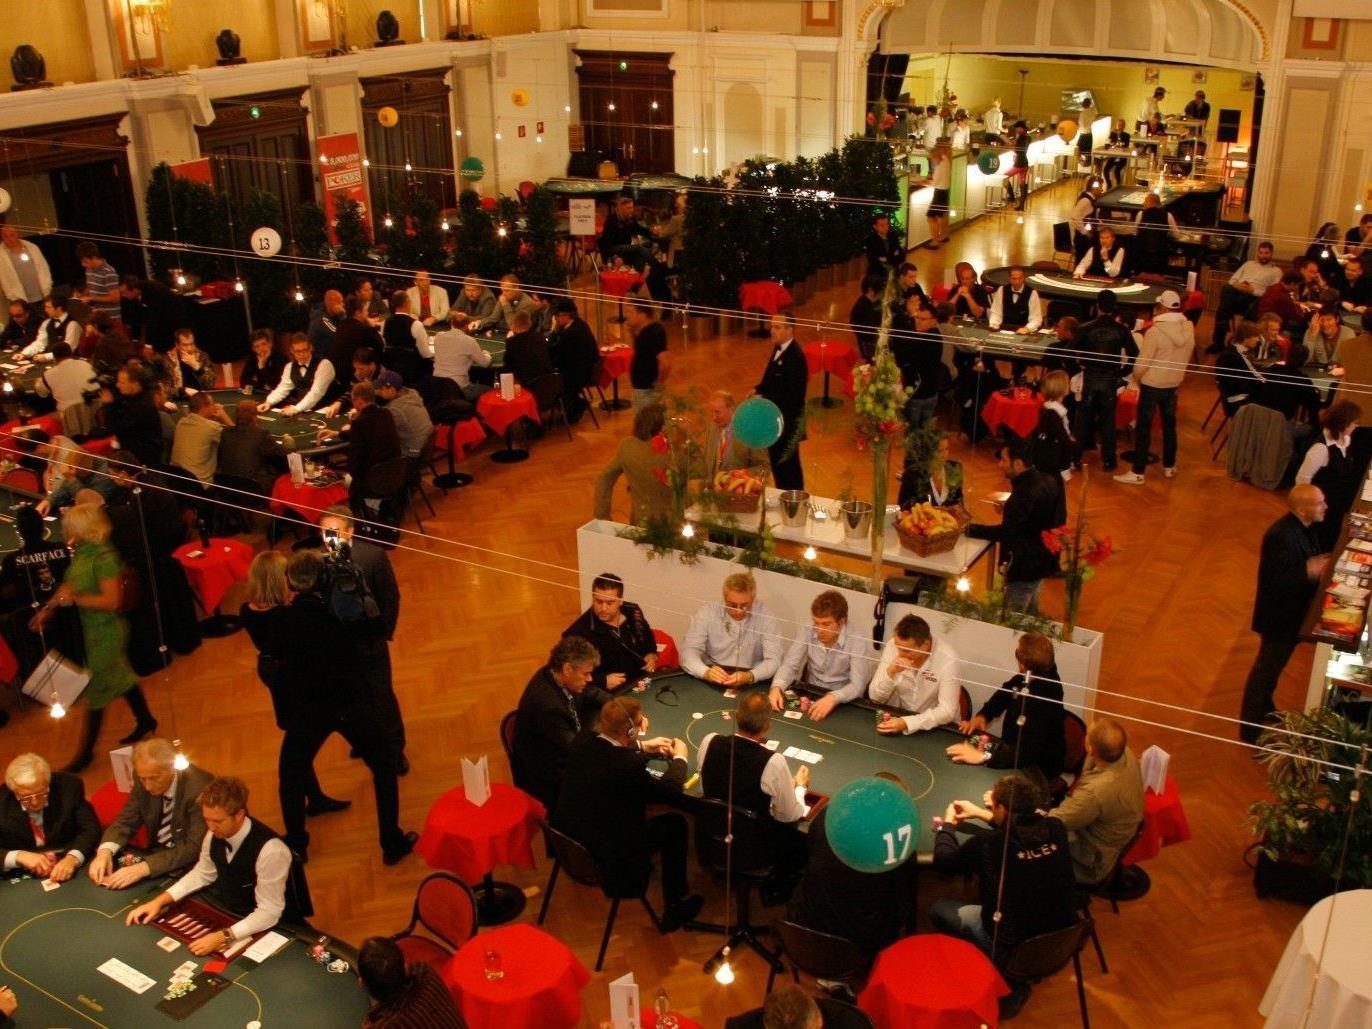 Am 25. Oktober 2012 startet die Poker-Europameisterschaft.